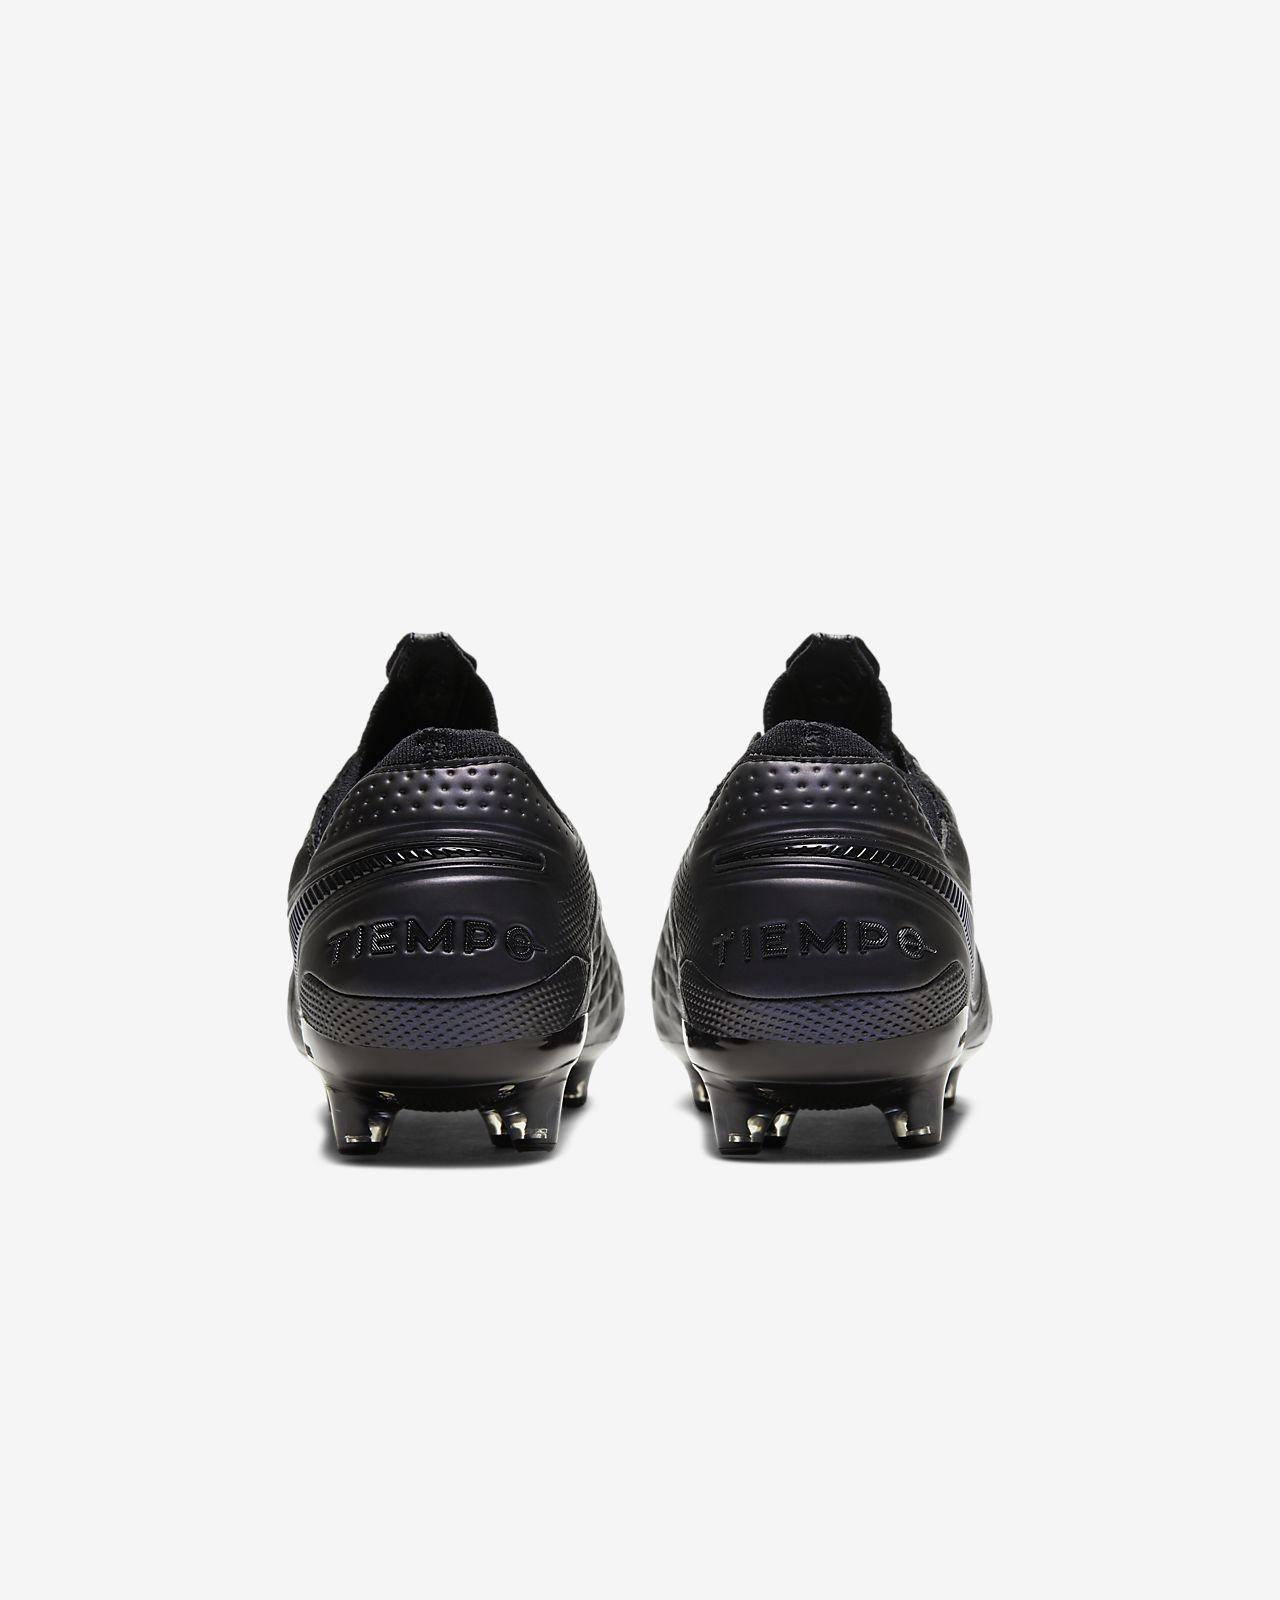 Nike Tiempo Legend VII Elite AG Pro Football Boots